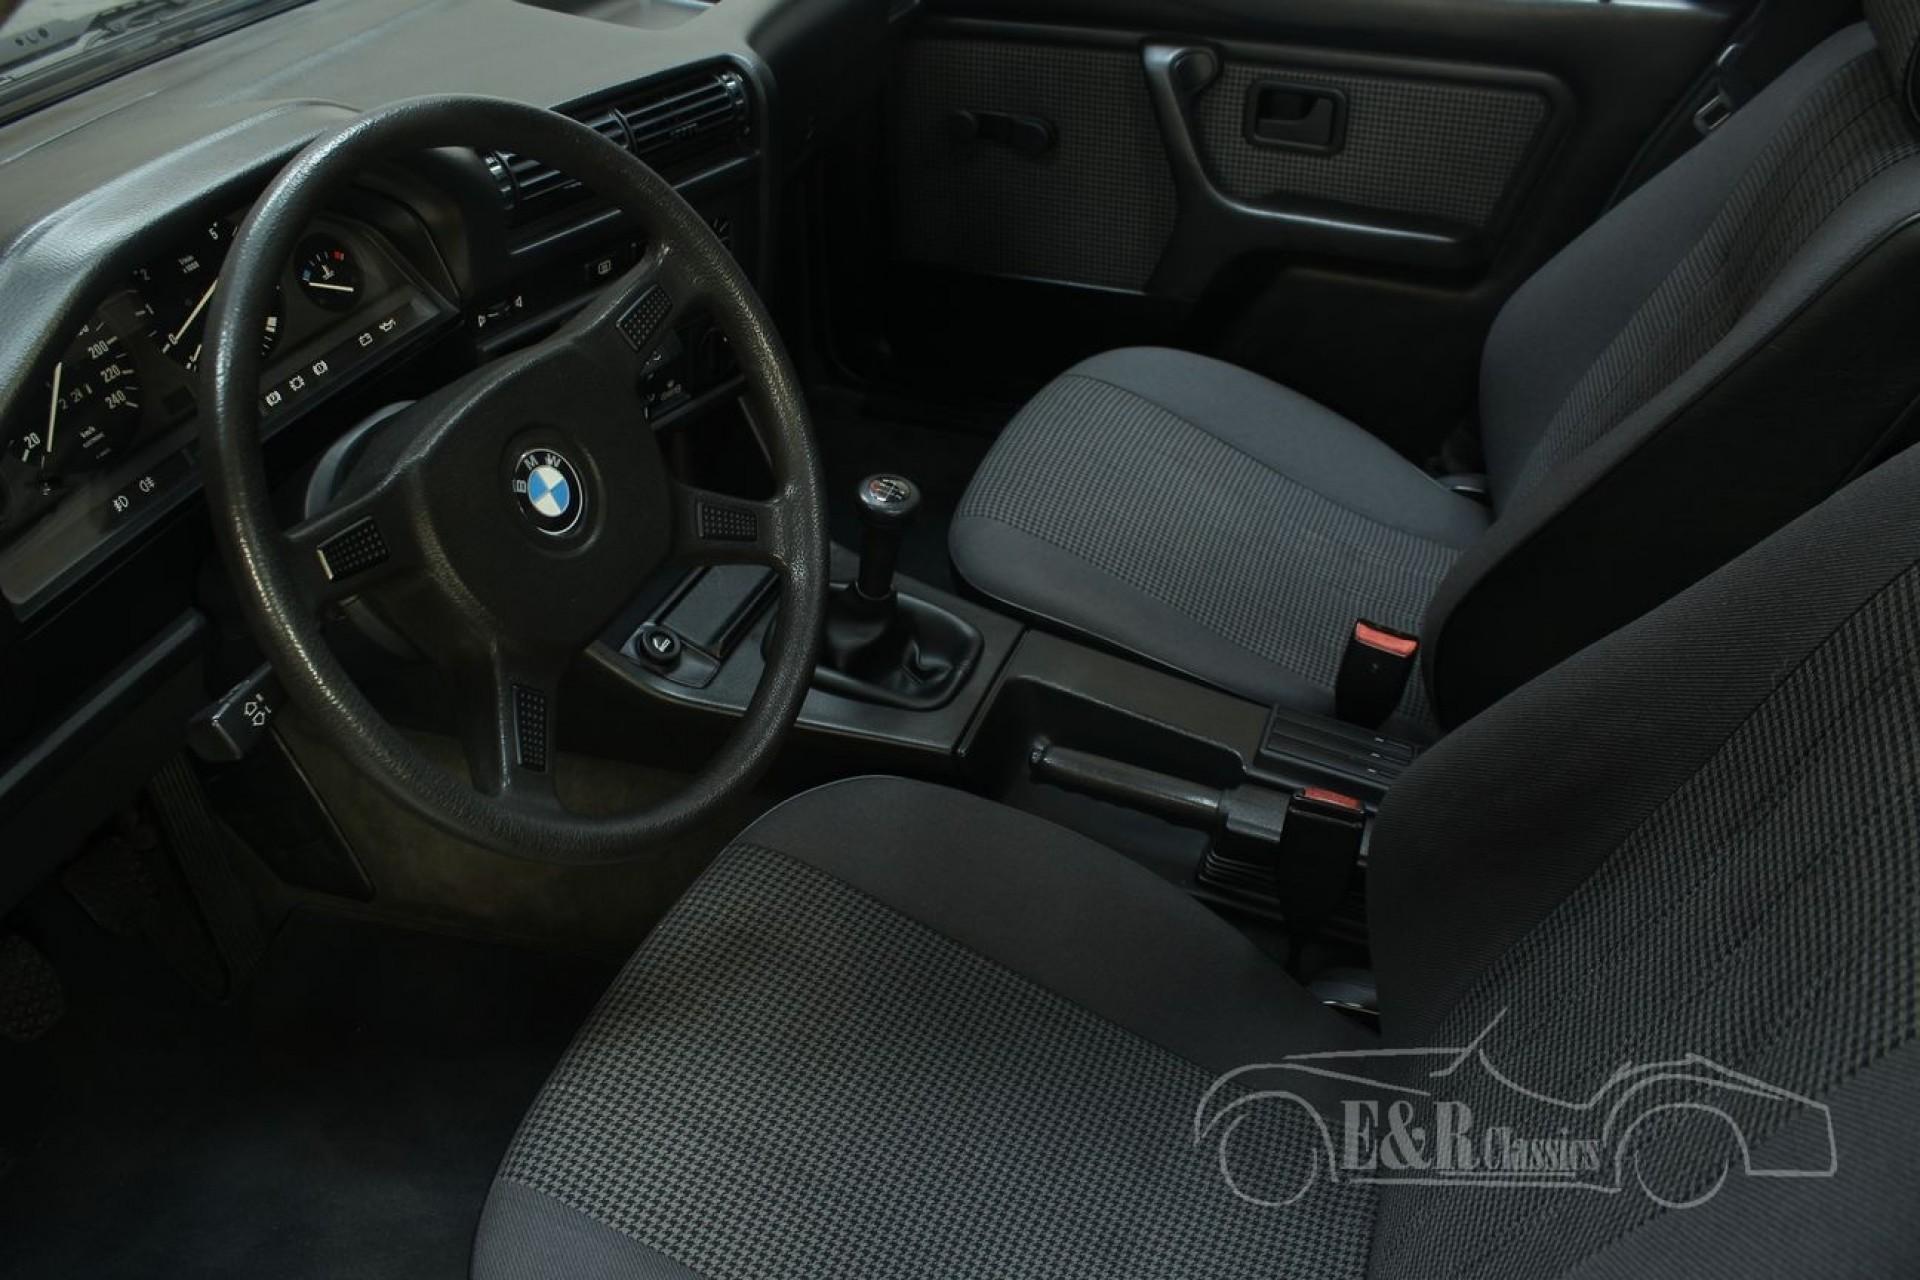 BMW 325i E30 1986 for sale at Erclassics